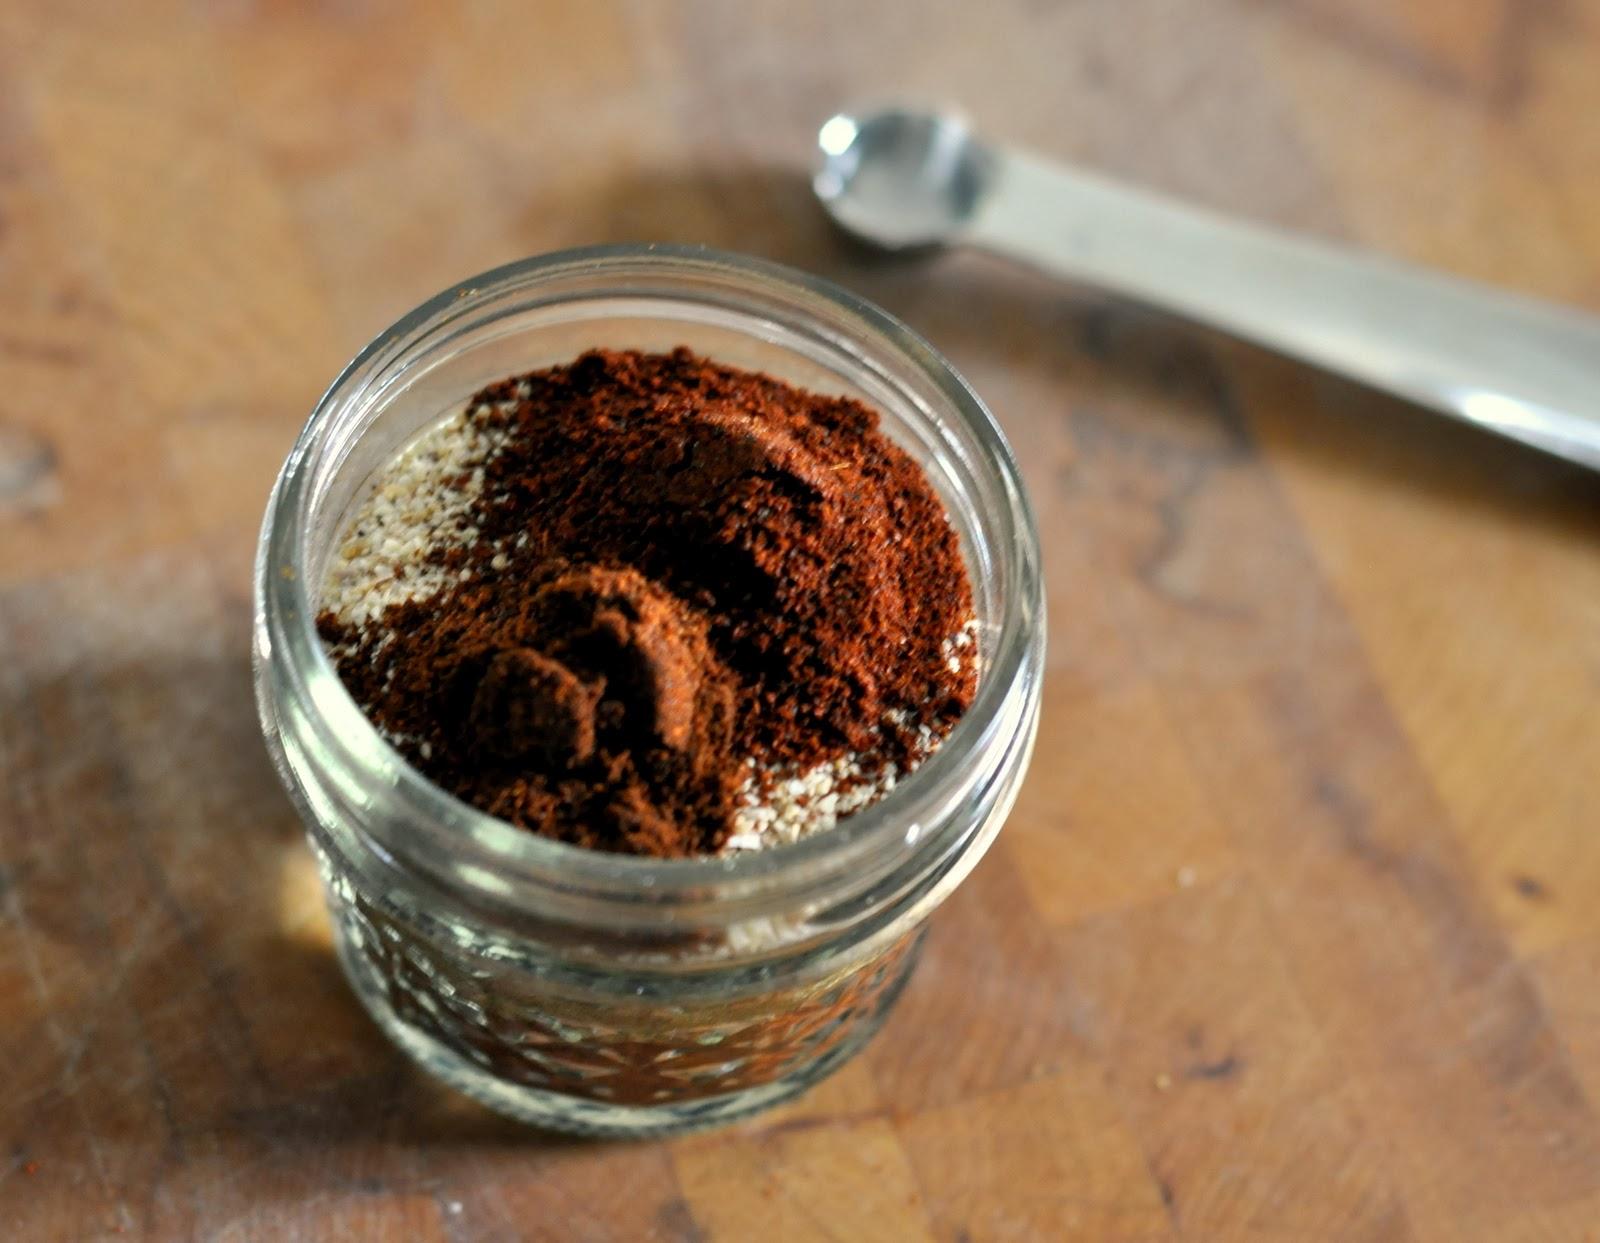 Chili Powder for Homemade Chili Seasoning | Taste As You Go